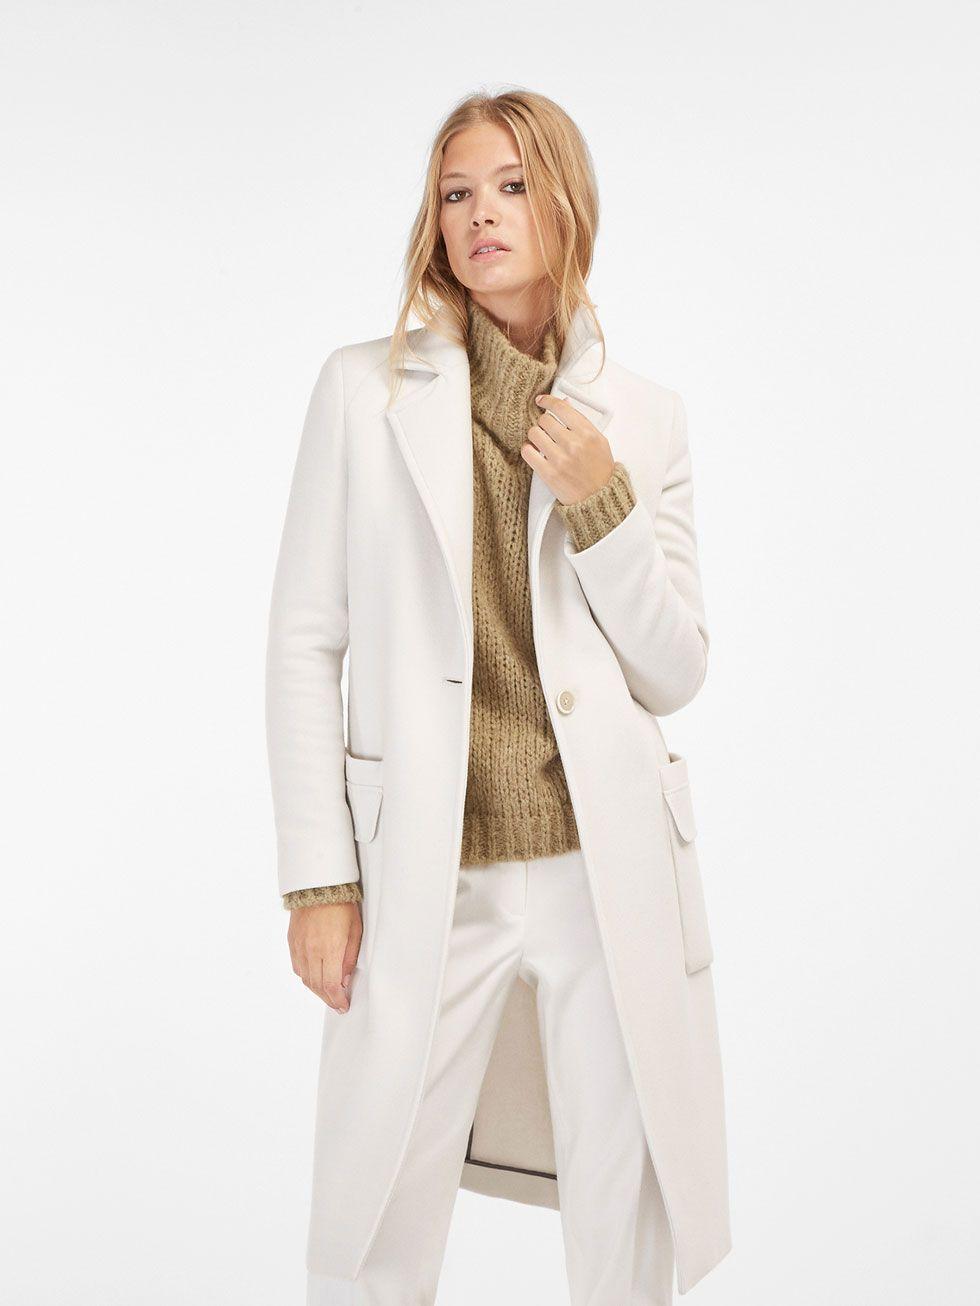 0c926169c6c5 Coats - WOMEN - Massimo Dutti | Massimo Dutti | Coat, Off white coat ...